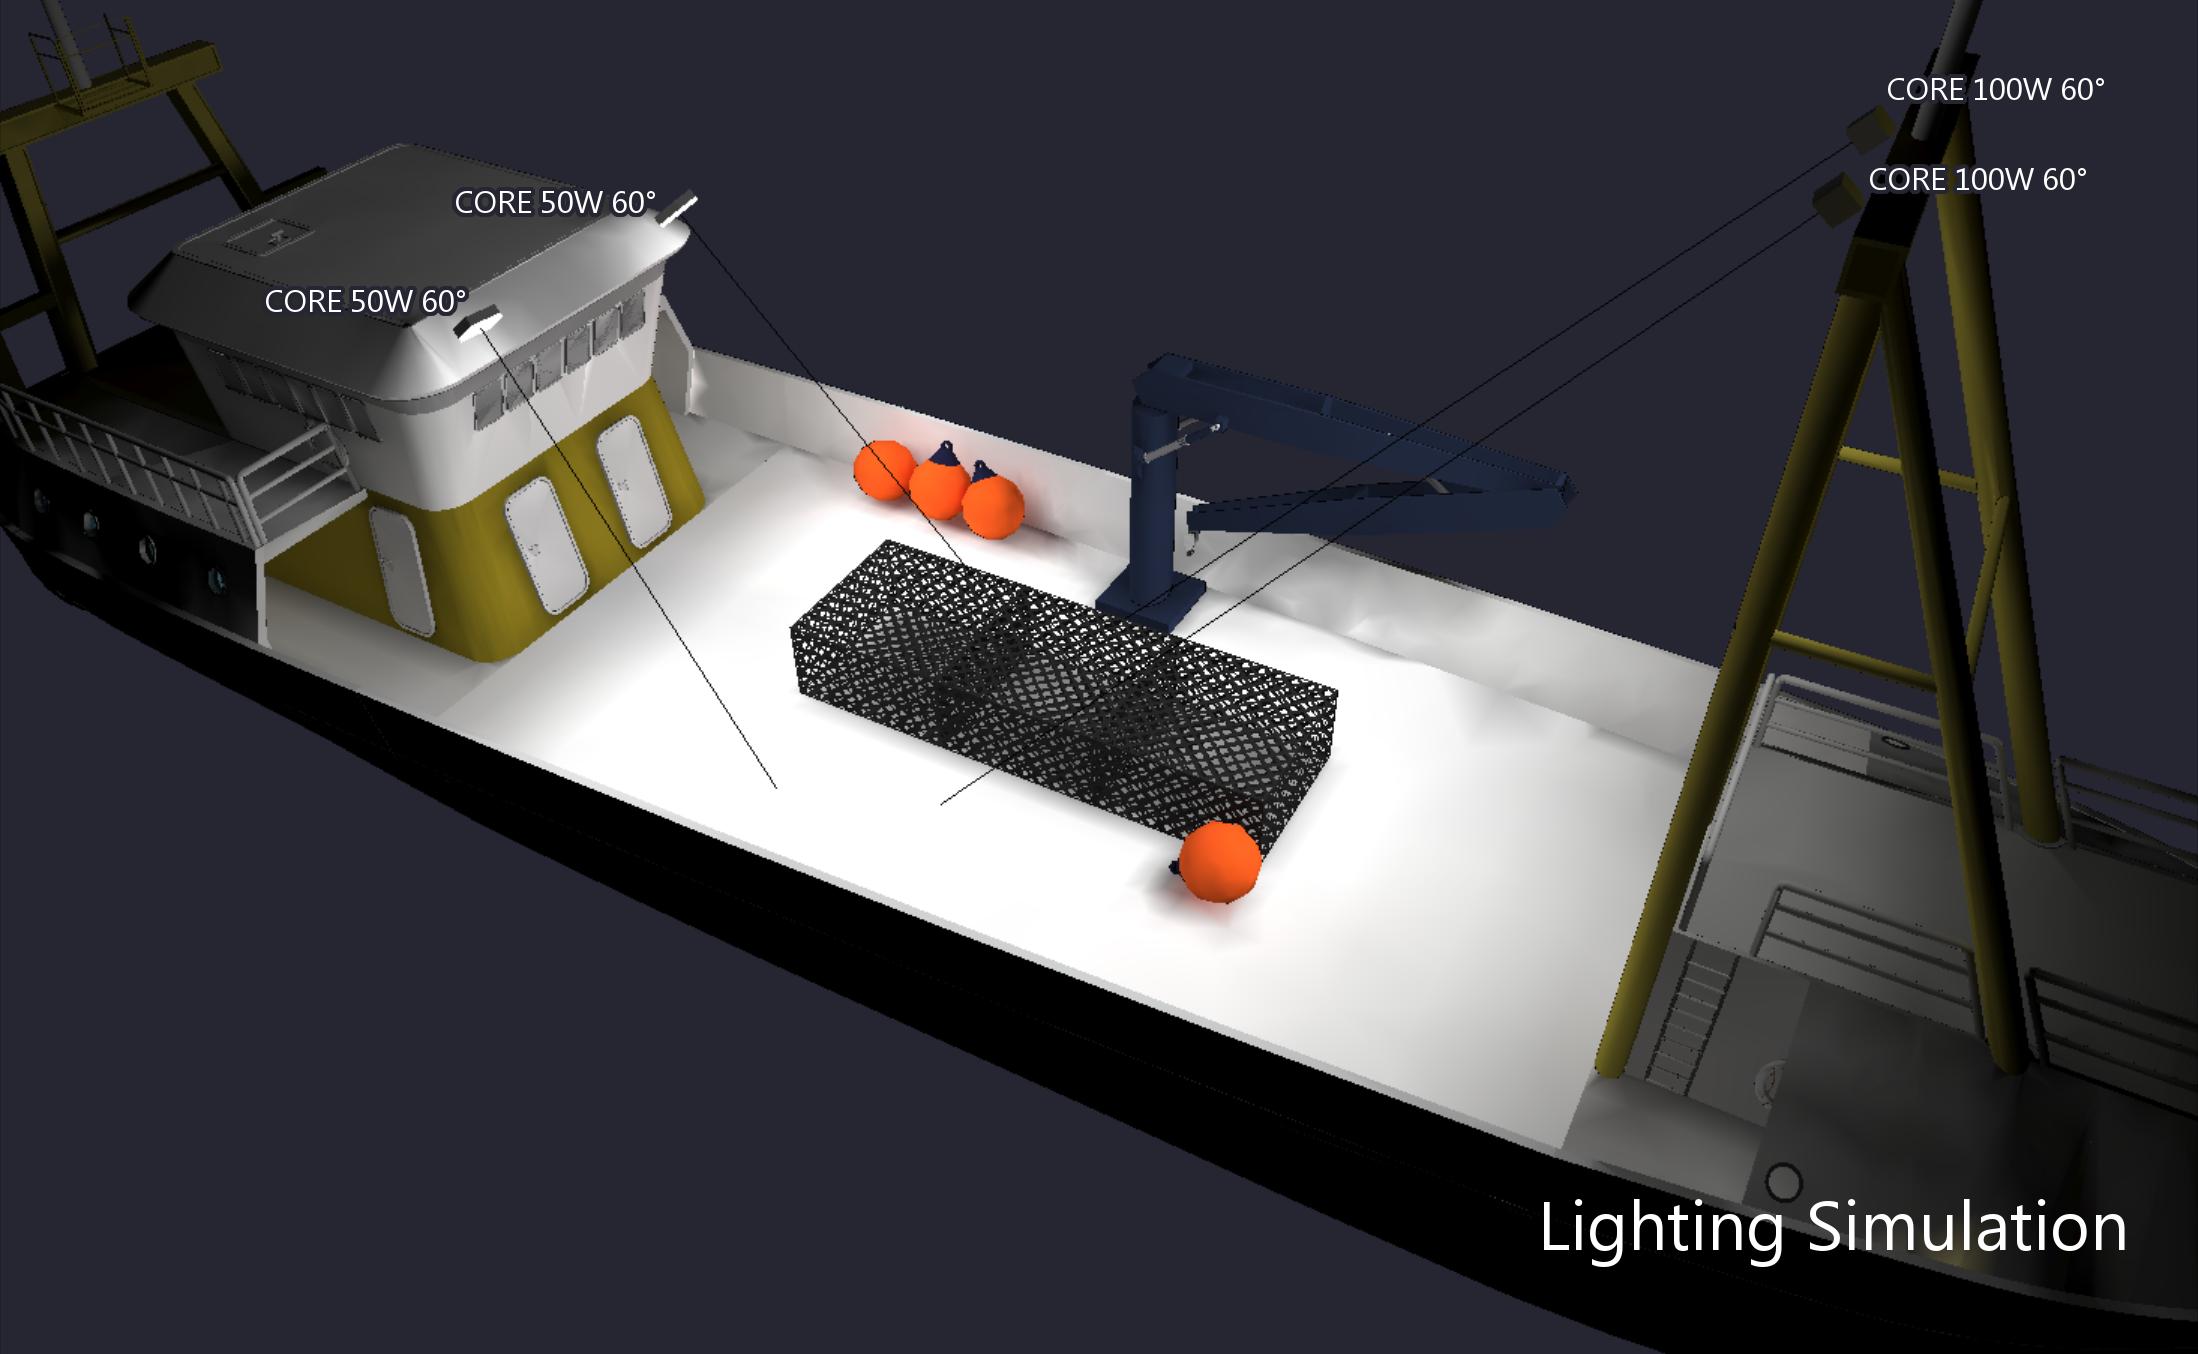 Lighting Simulation Rendering